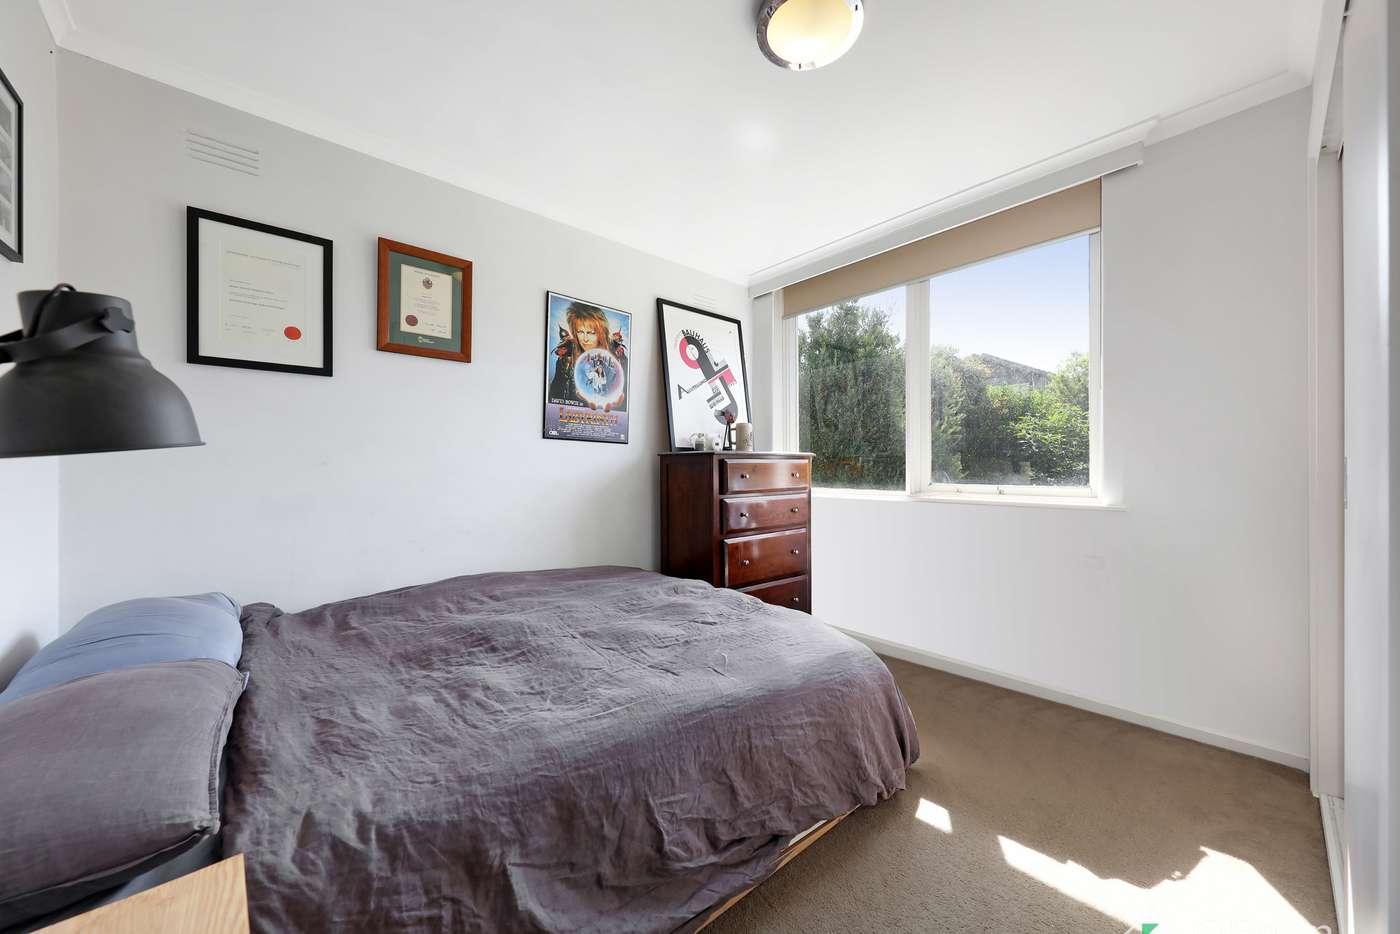 Sixth view of Homely apartment listing, 7/53 Kellett Street, Northcote VIC 3070